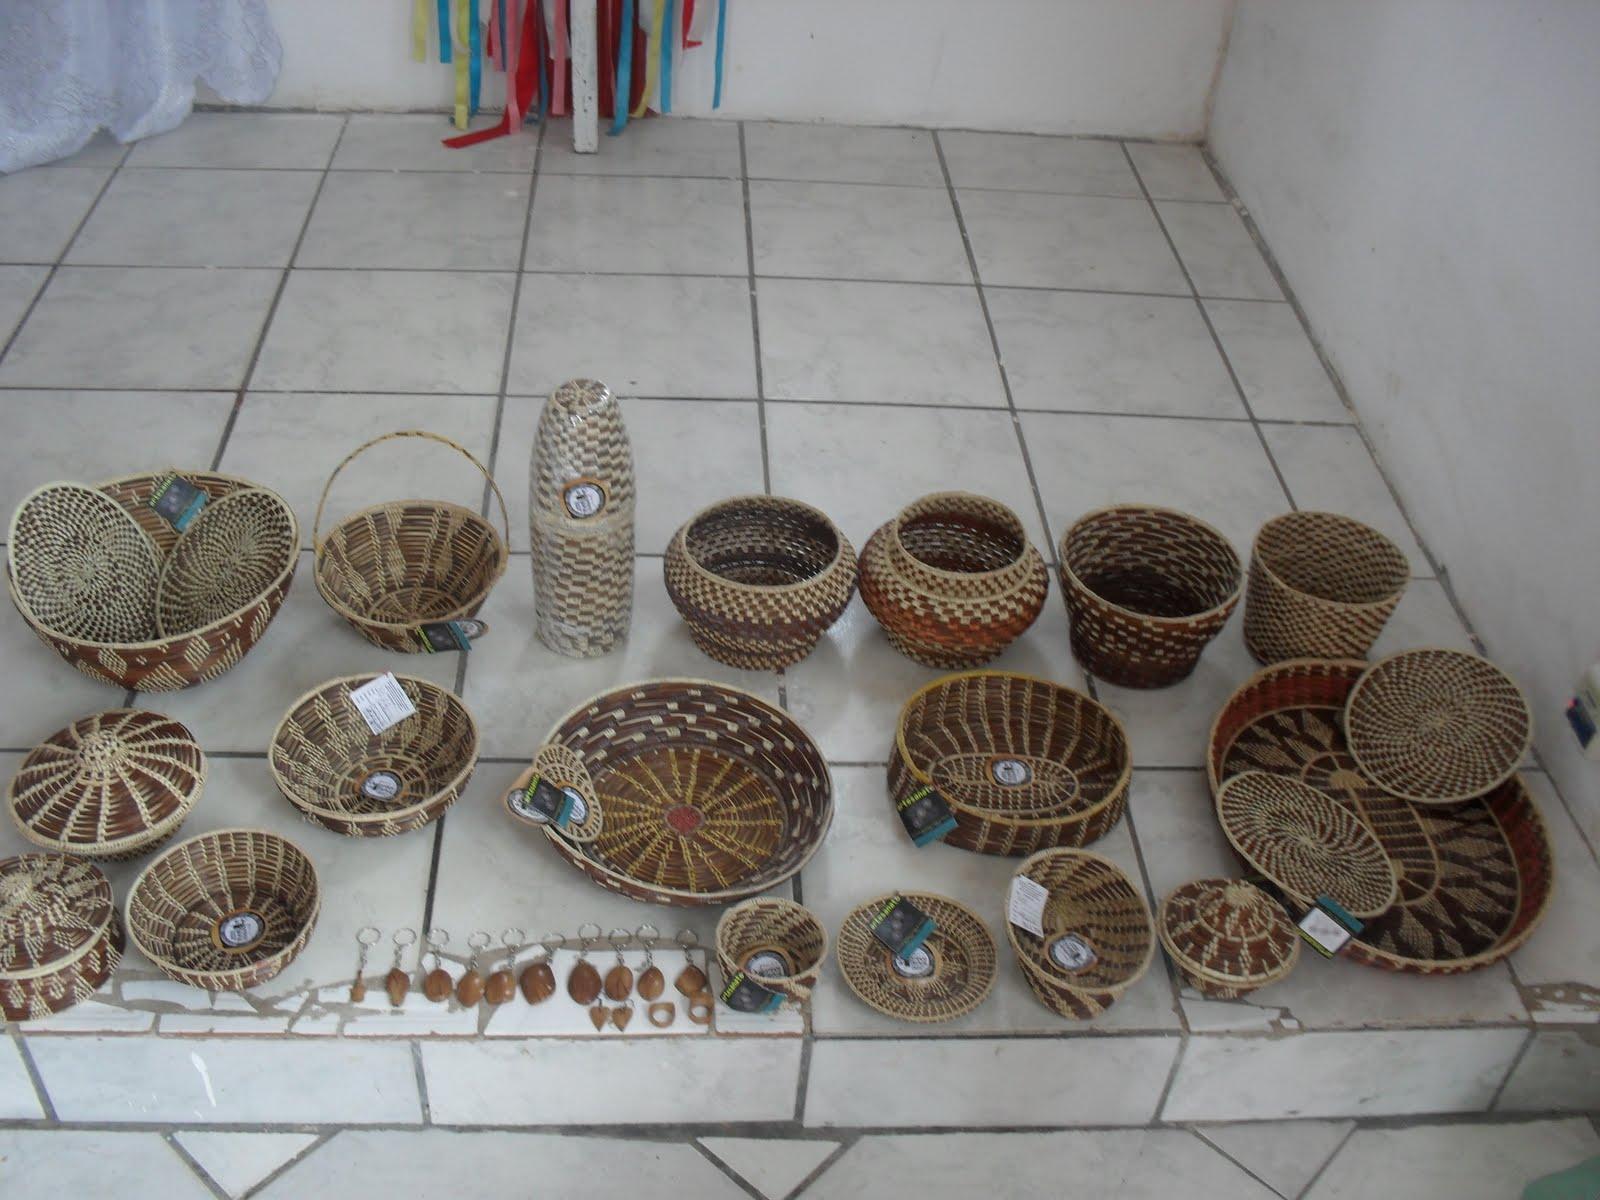 Adesivo Infantil De Parede ~ COMUNIDADE QUILOMBOLA ARTESANATOS